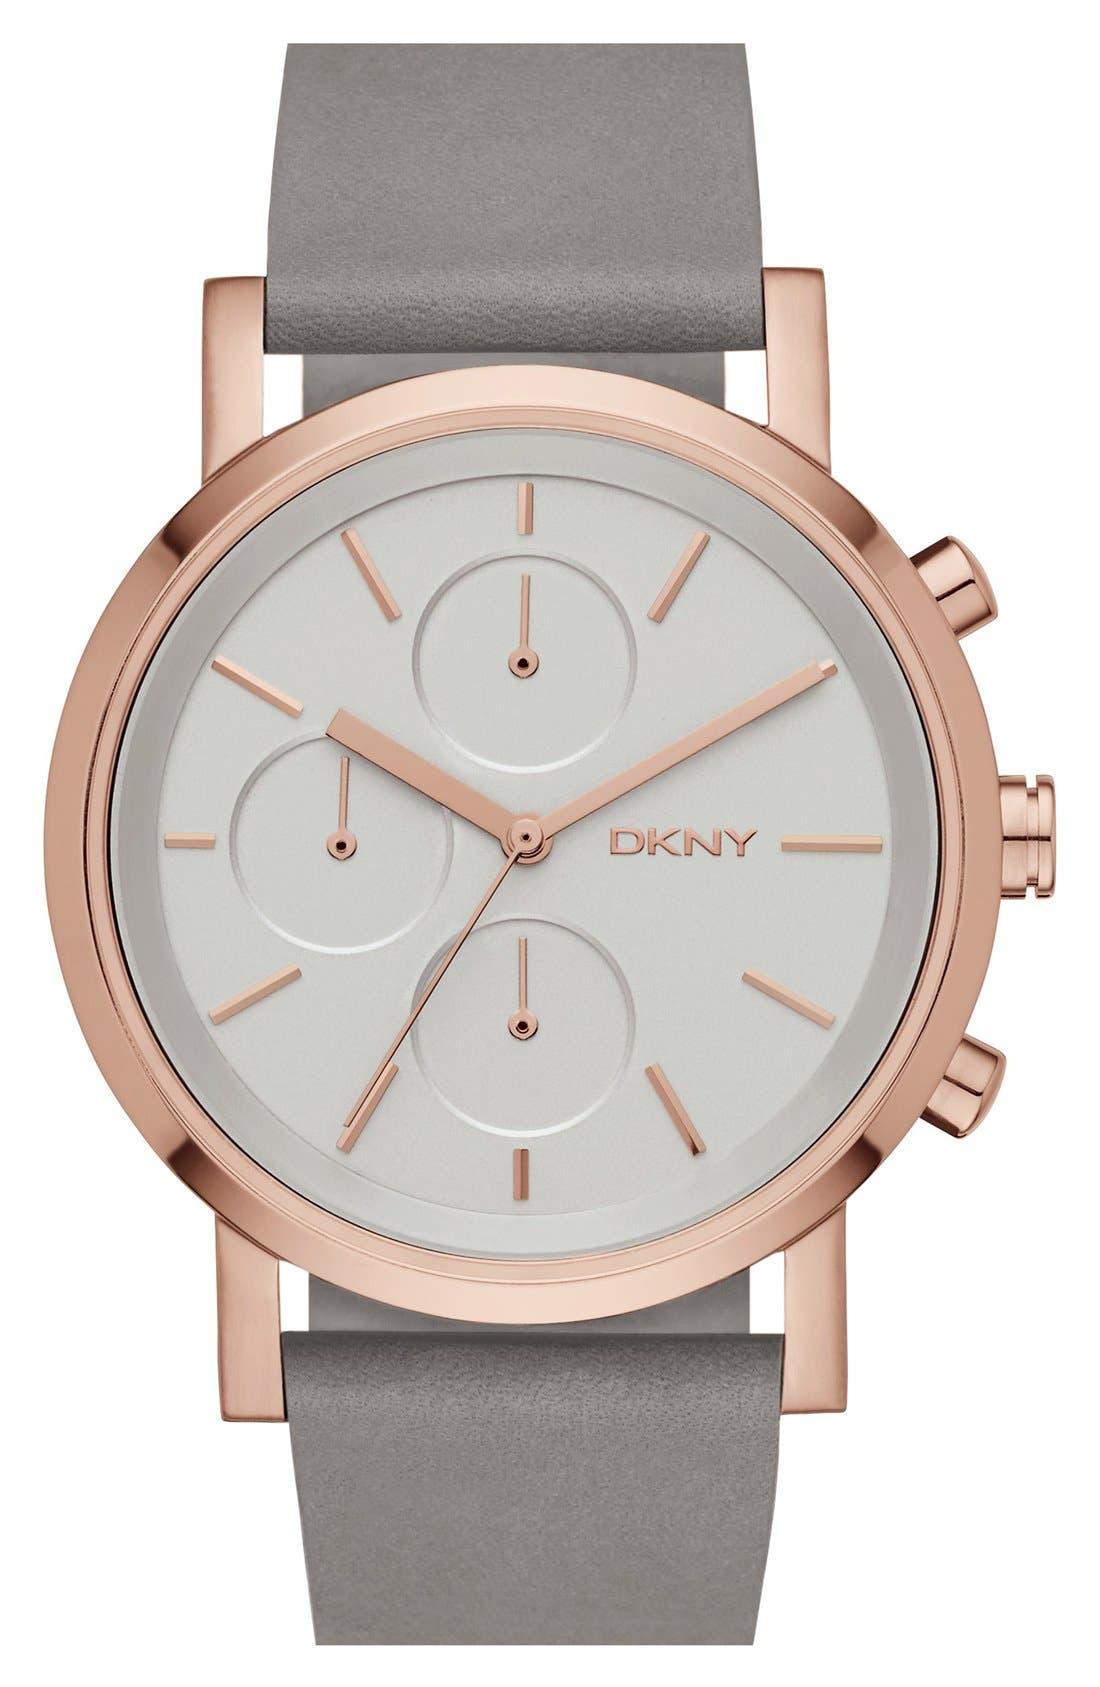 Main Image - DKNY 'Soho' Chronograph Leather Strap Watch, 38mm